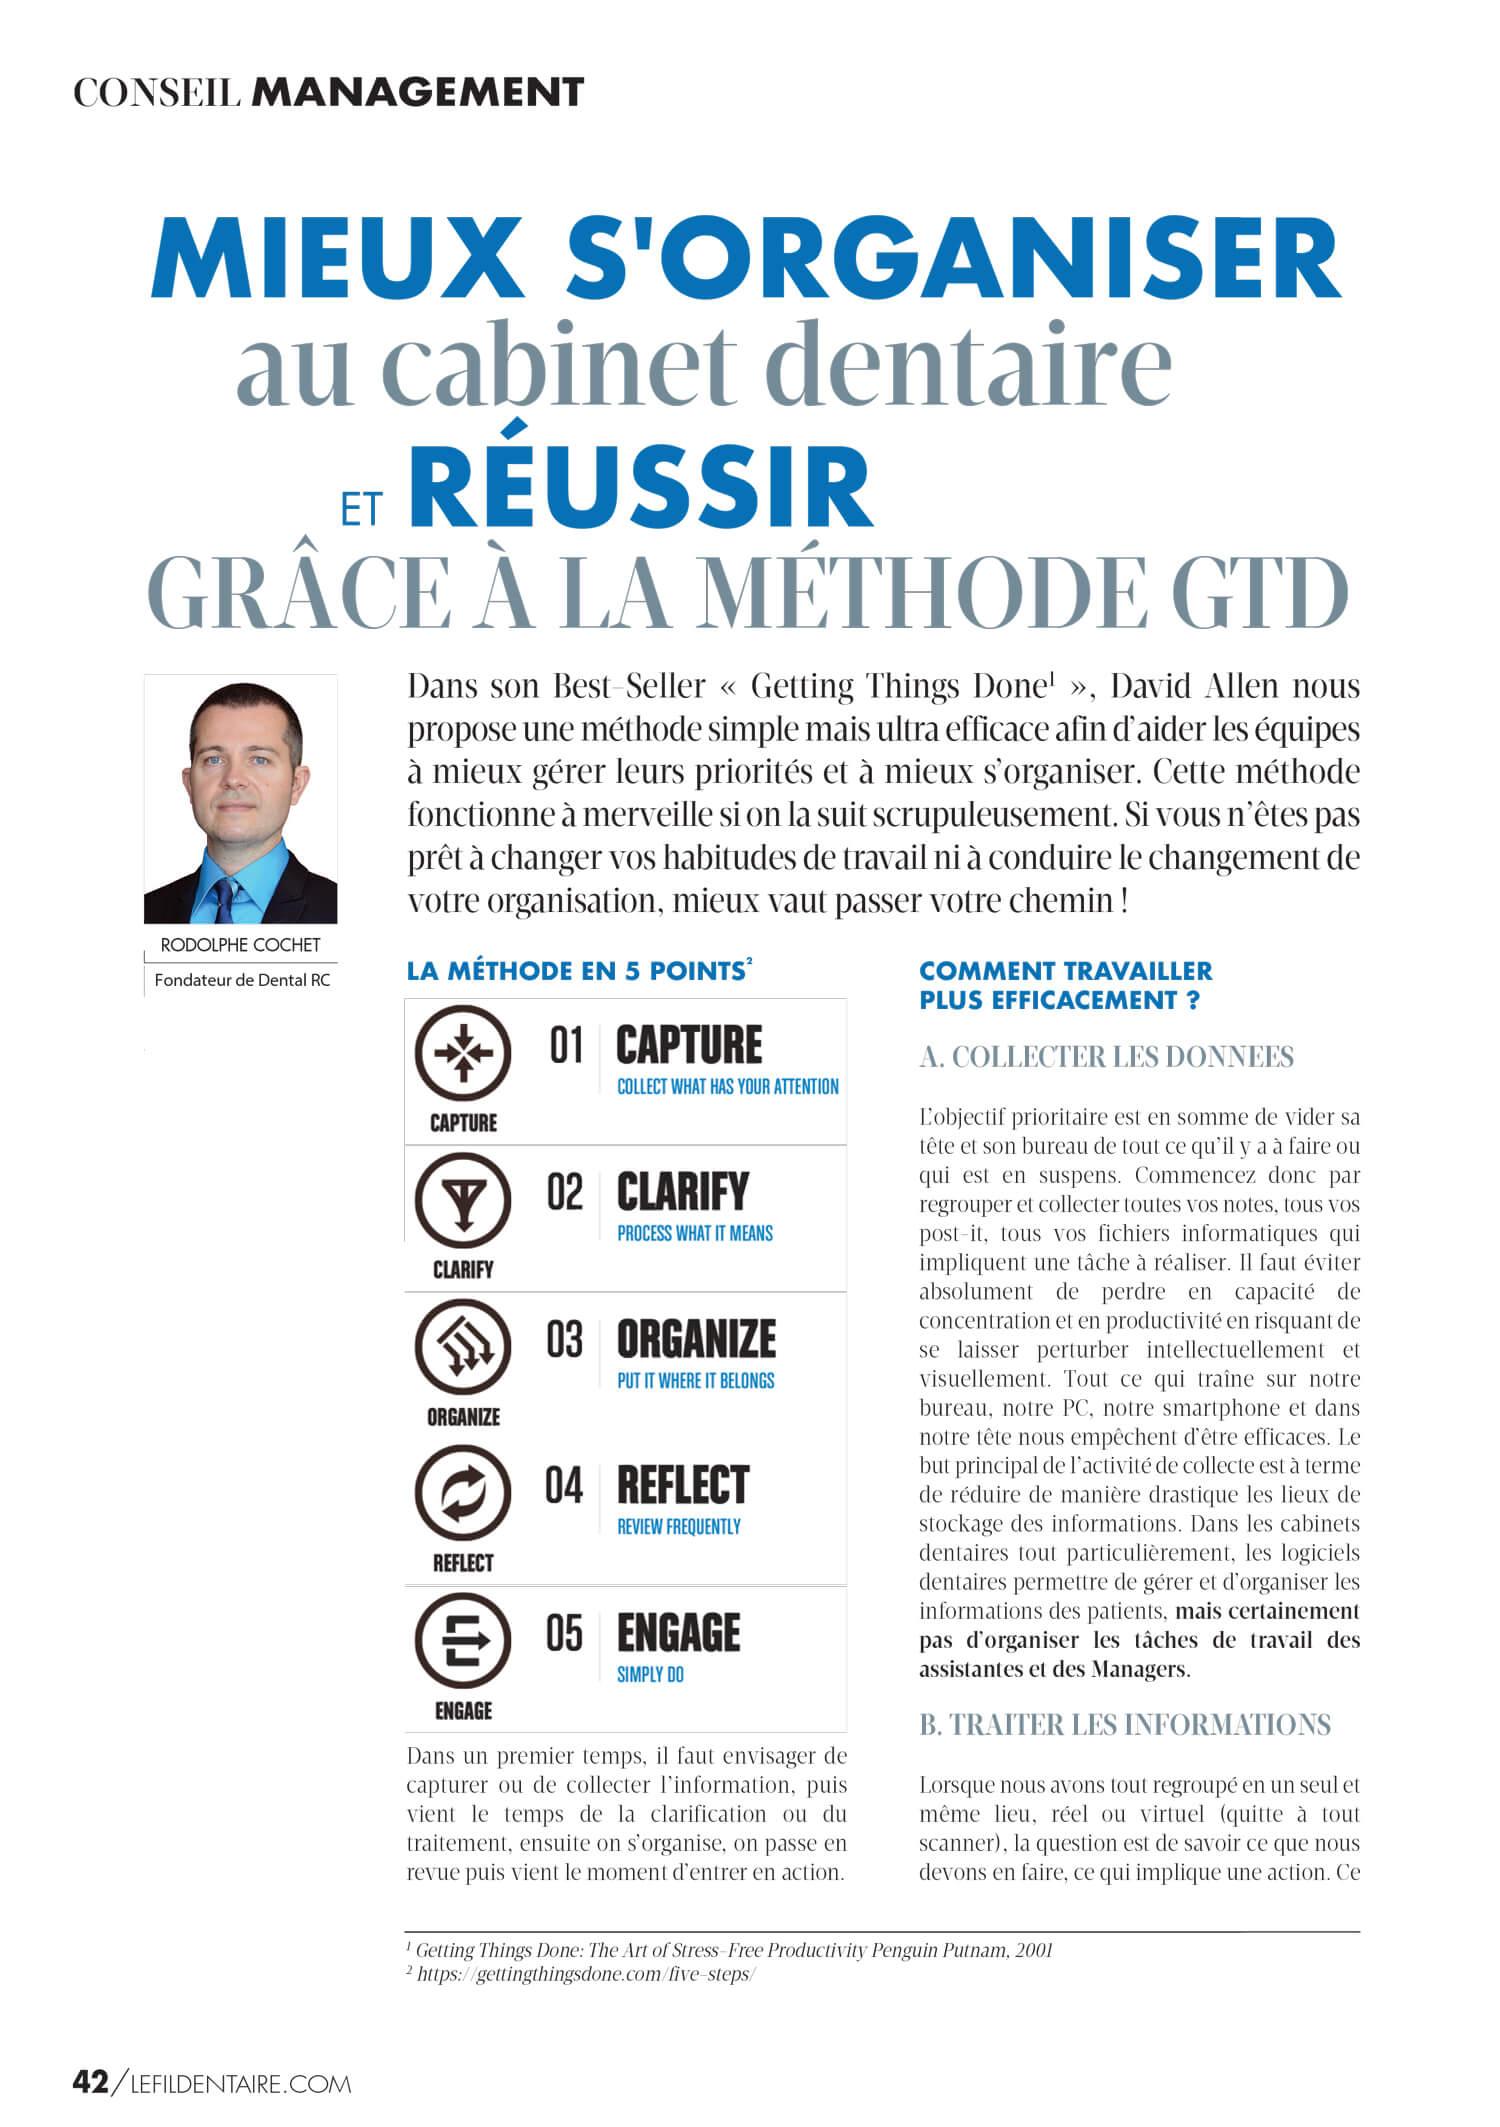 Mieux_organiser_methode_GTD_au_cabinet_dentaire_Rodolphe_Cochet.jpg